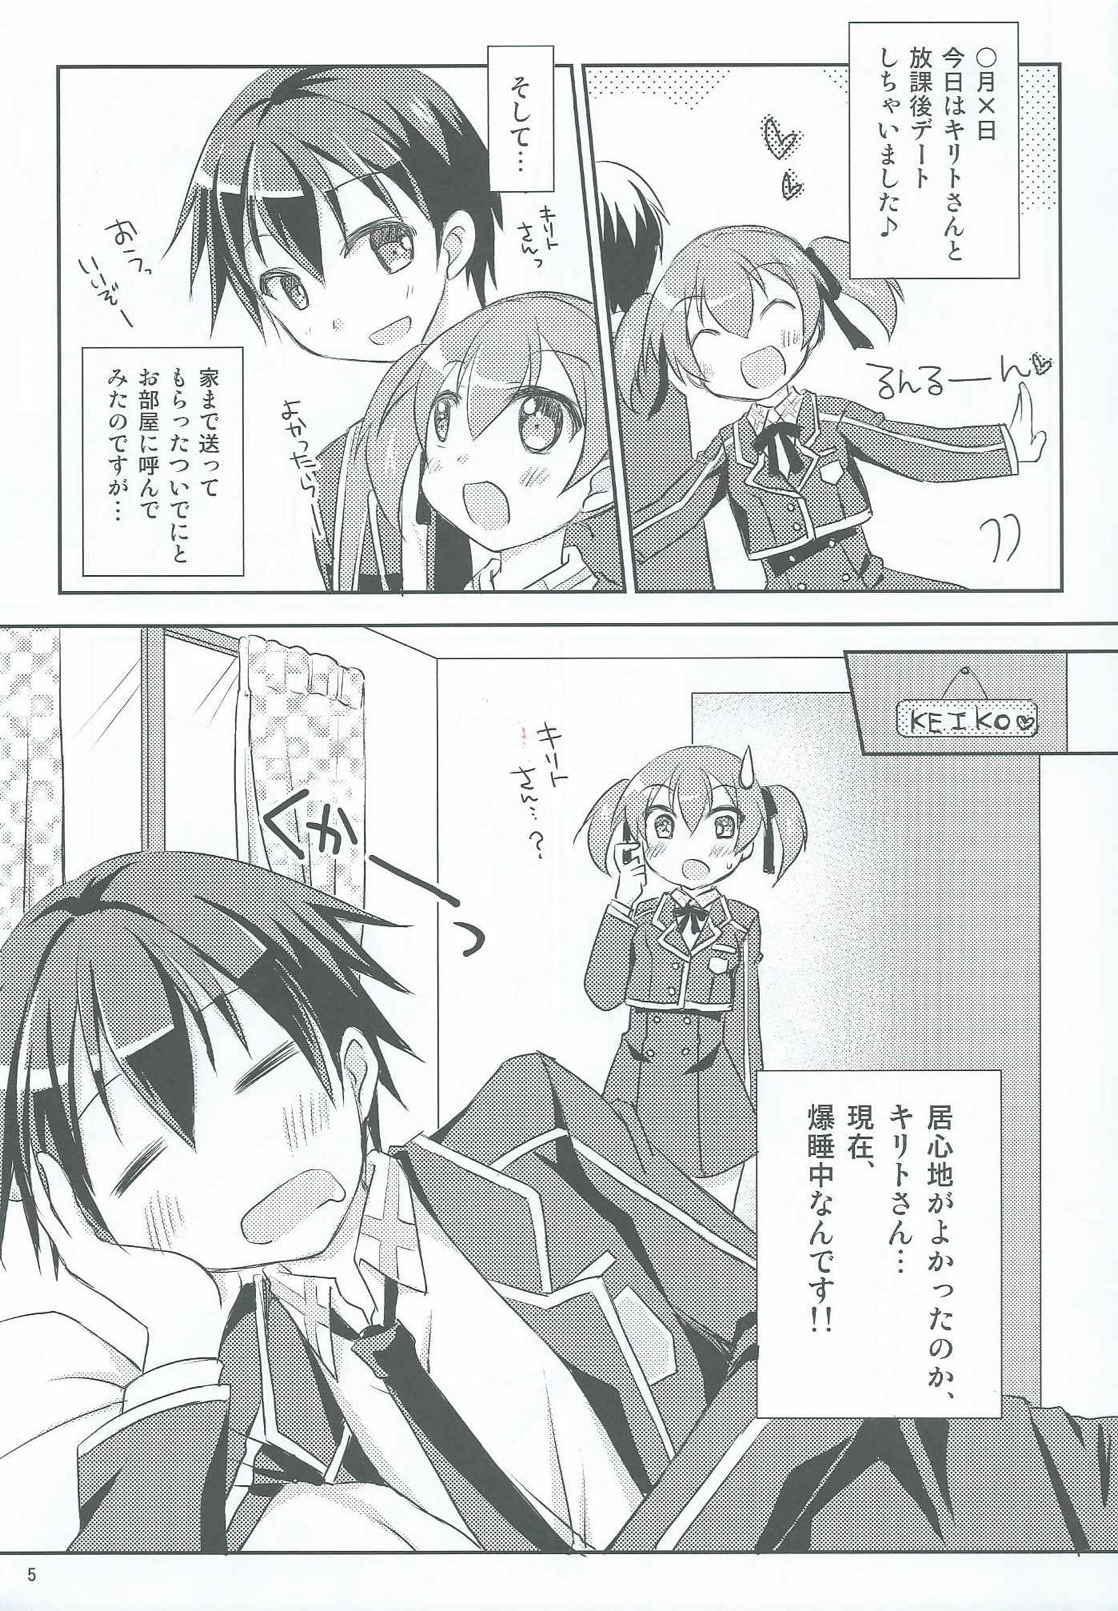 Itazura Silica-chan 2